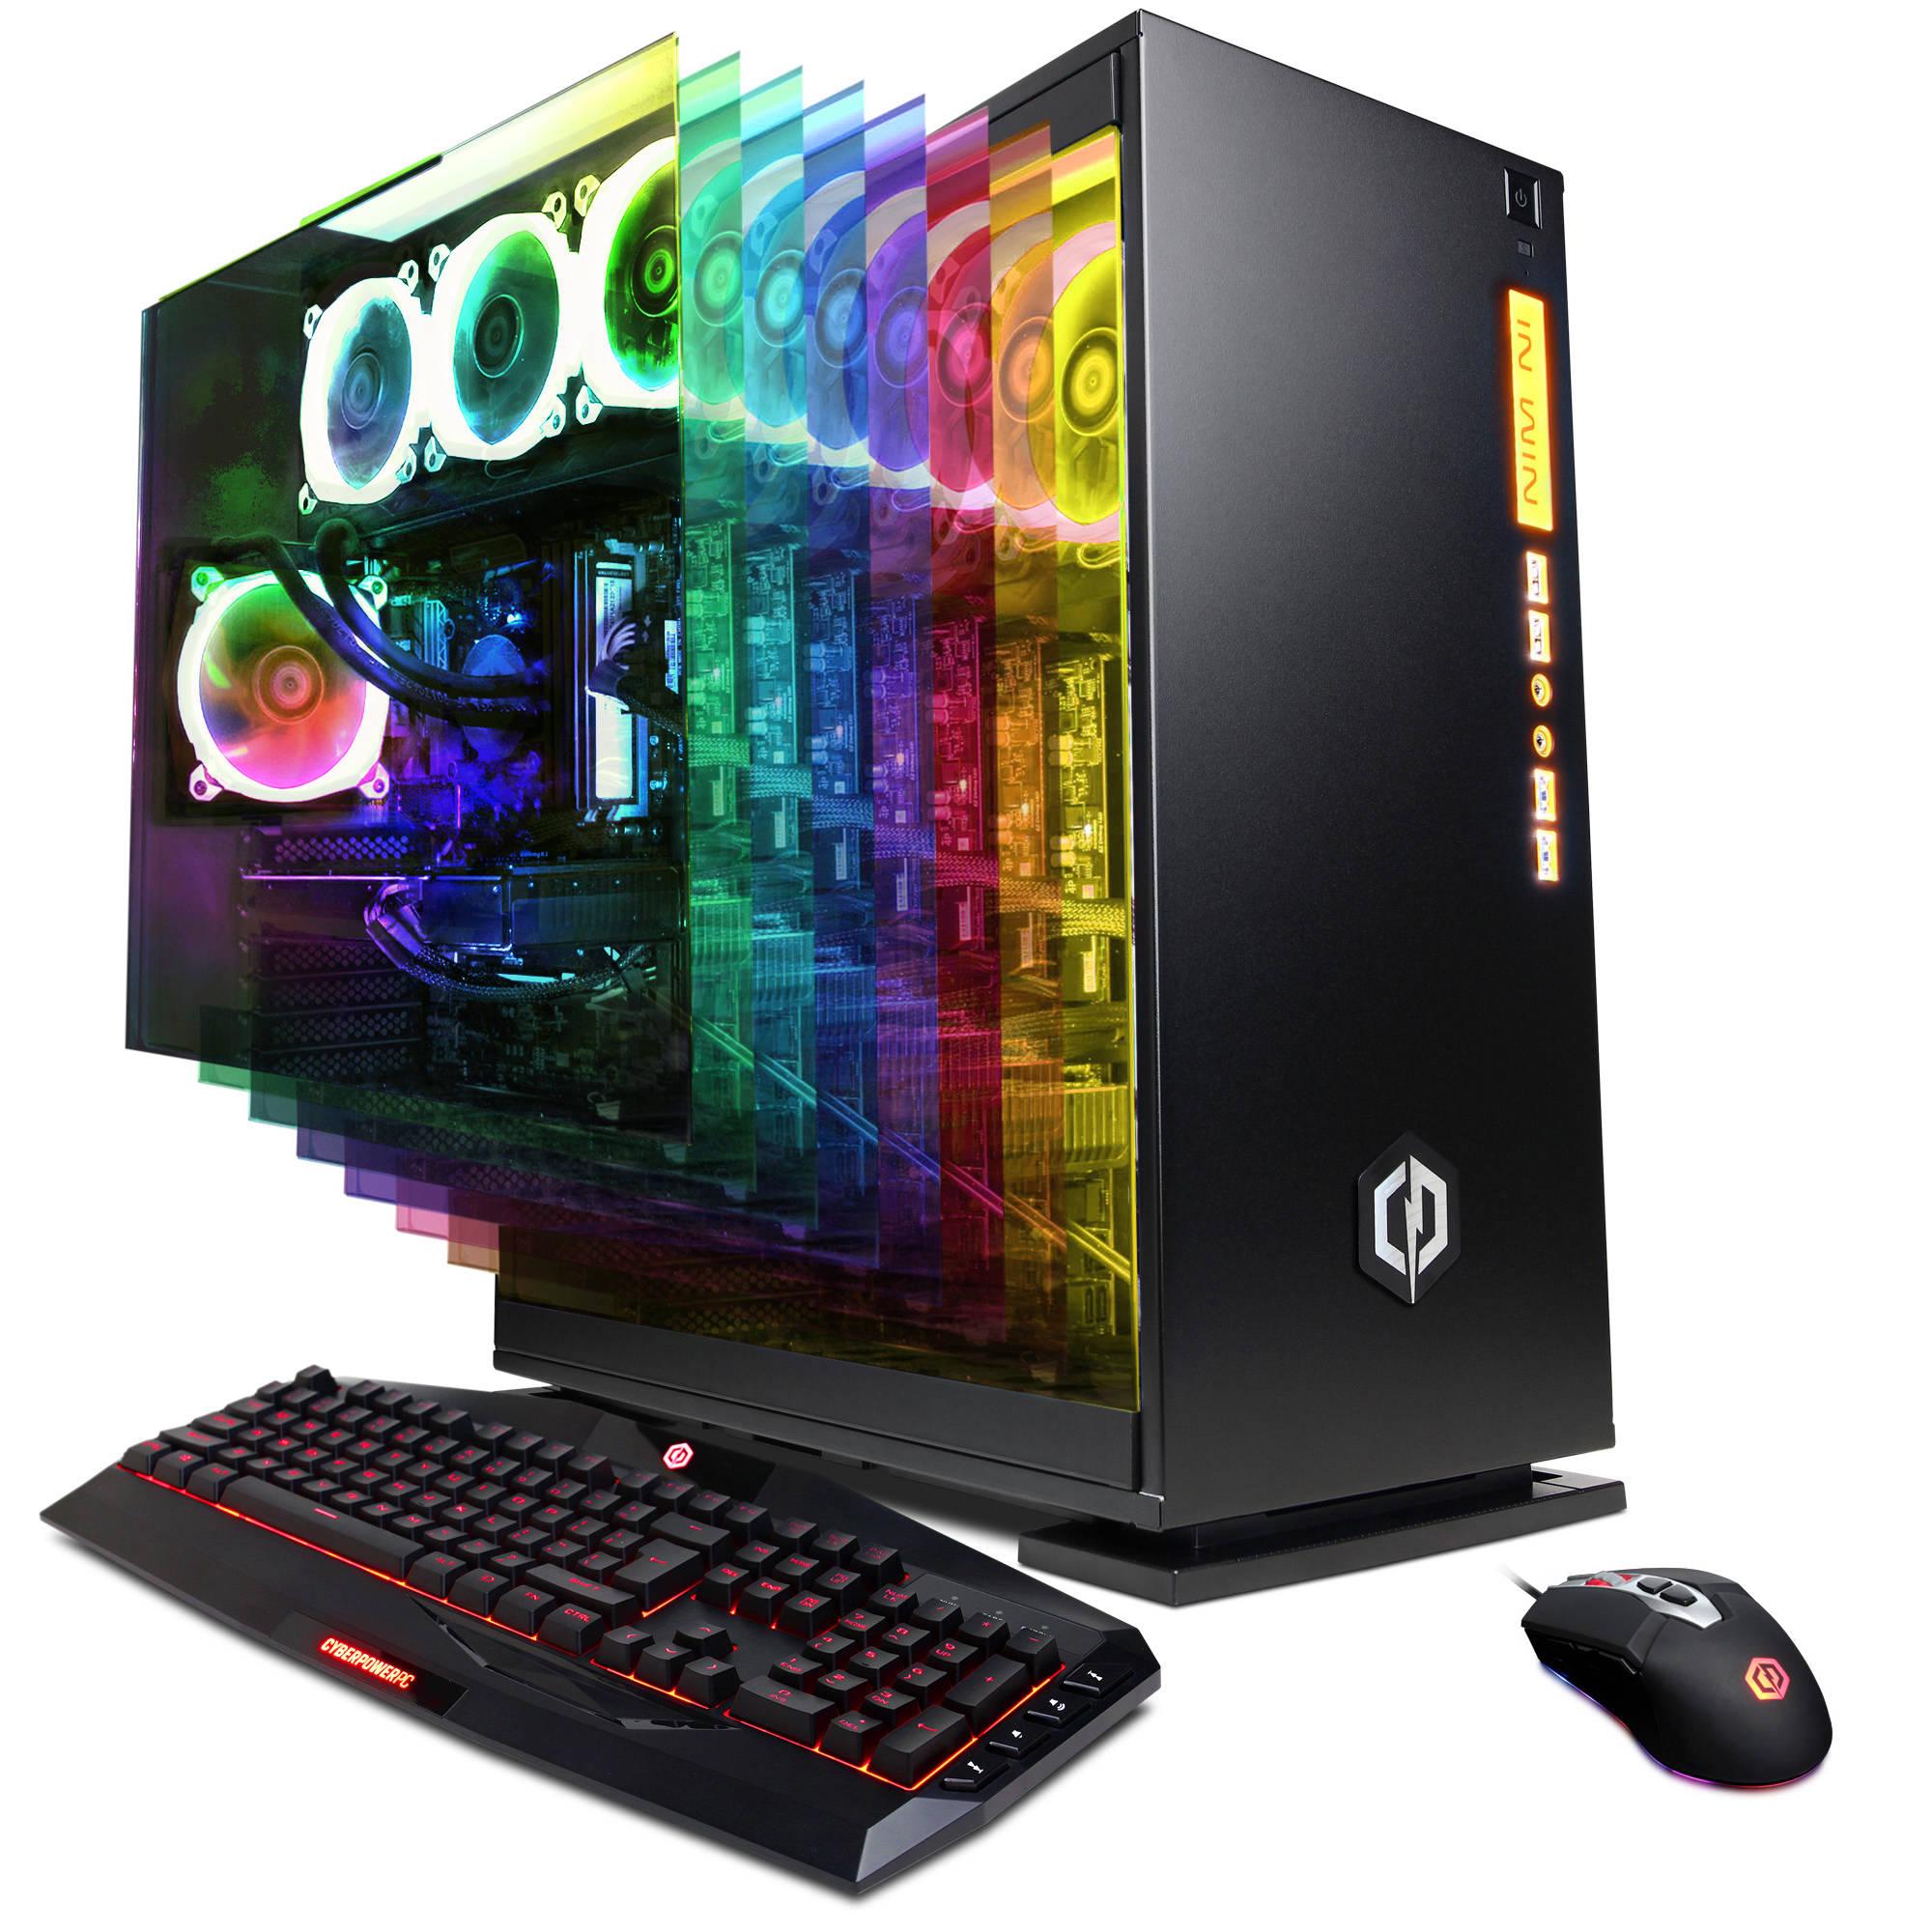 555cd456523 cyberpowerpc_slc9120cpg_gamer_supreme_liquid_cool_1432909.jpg